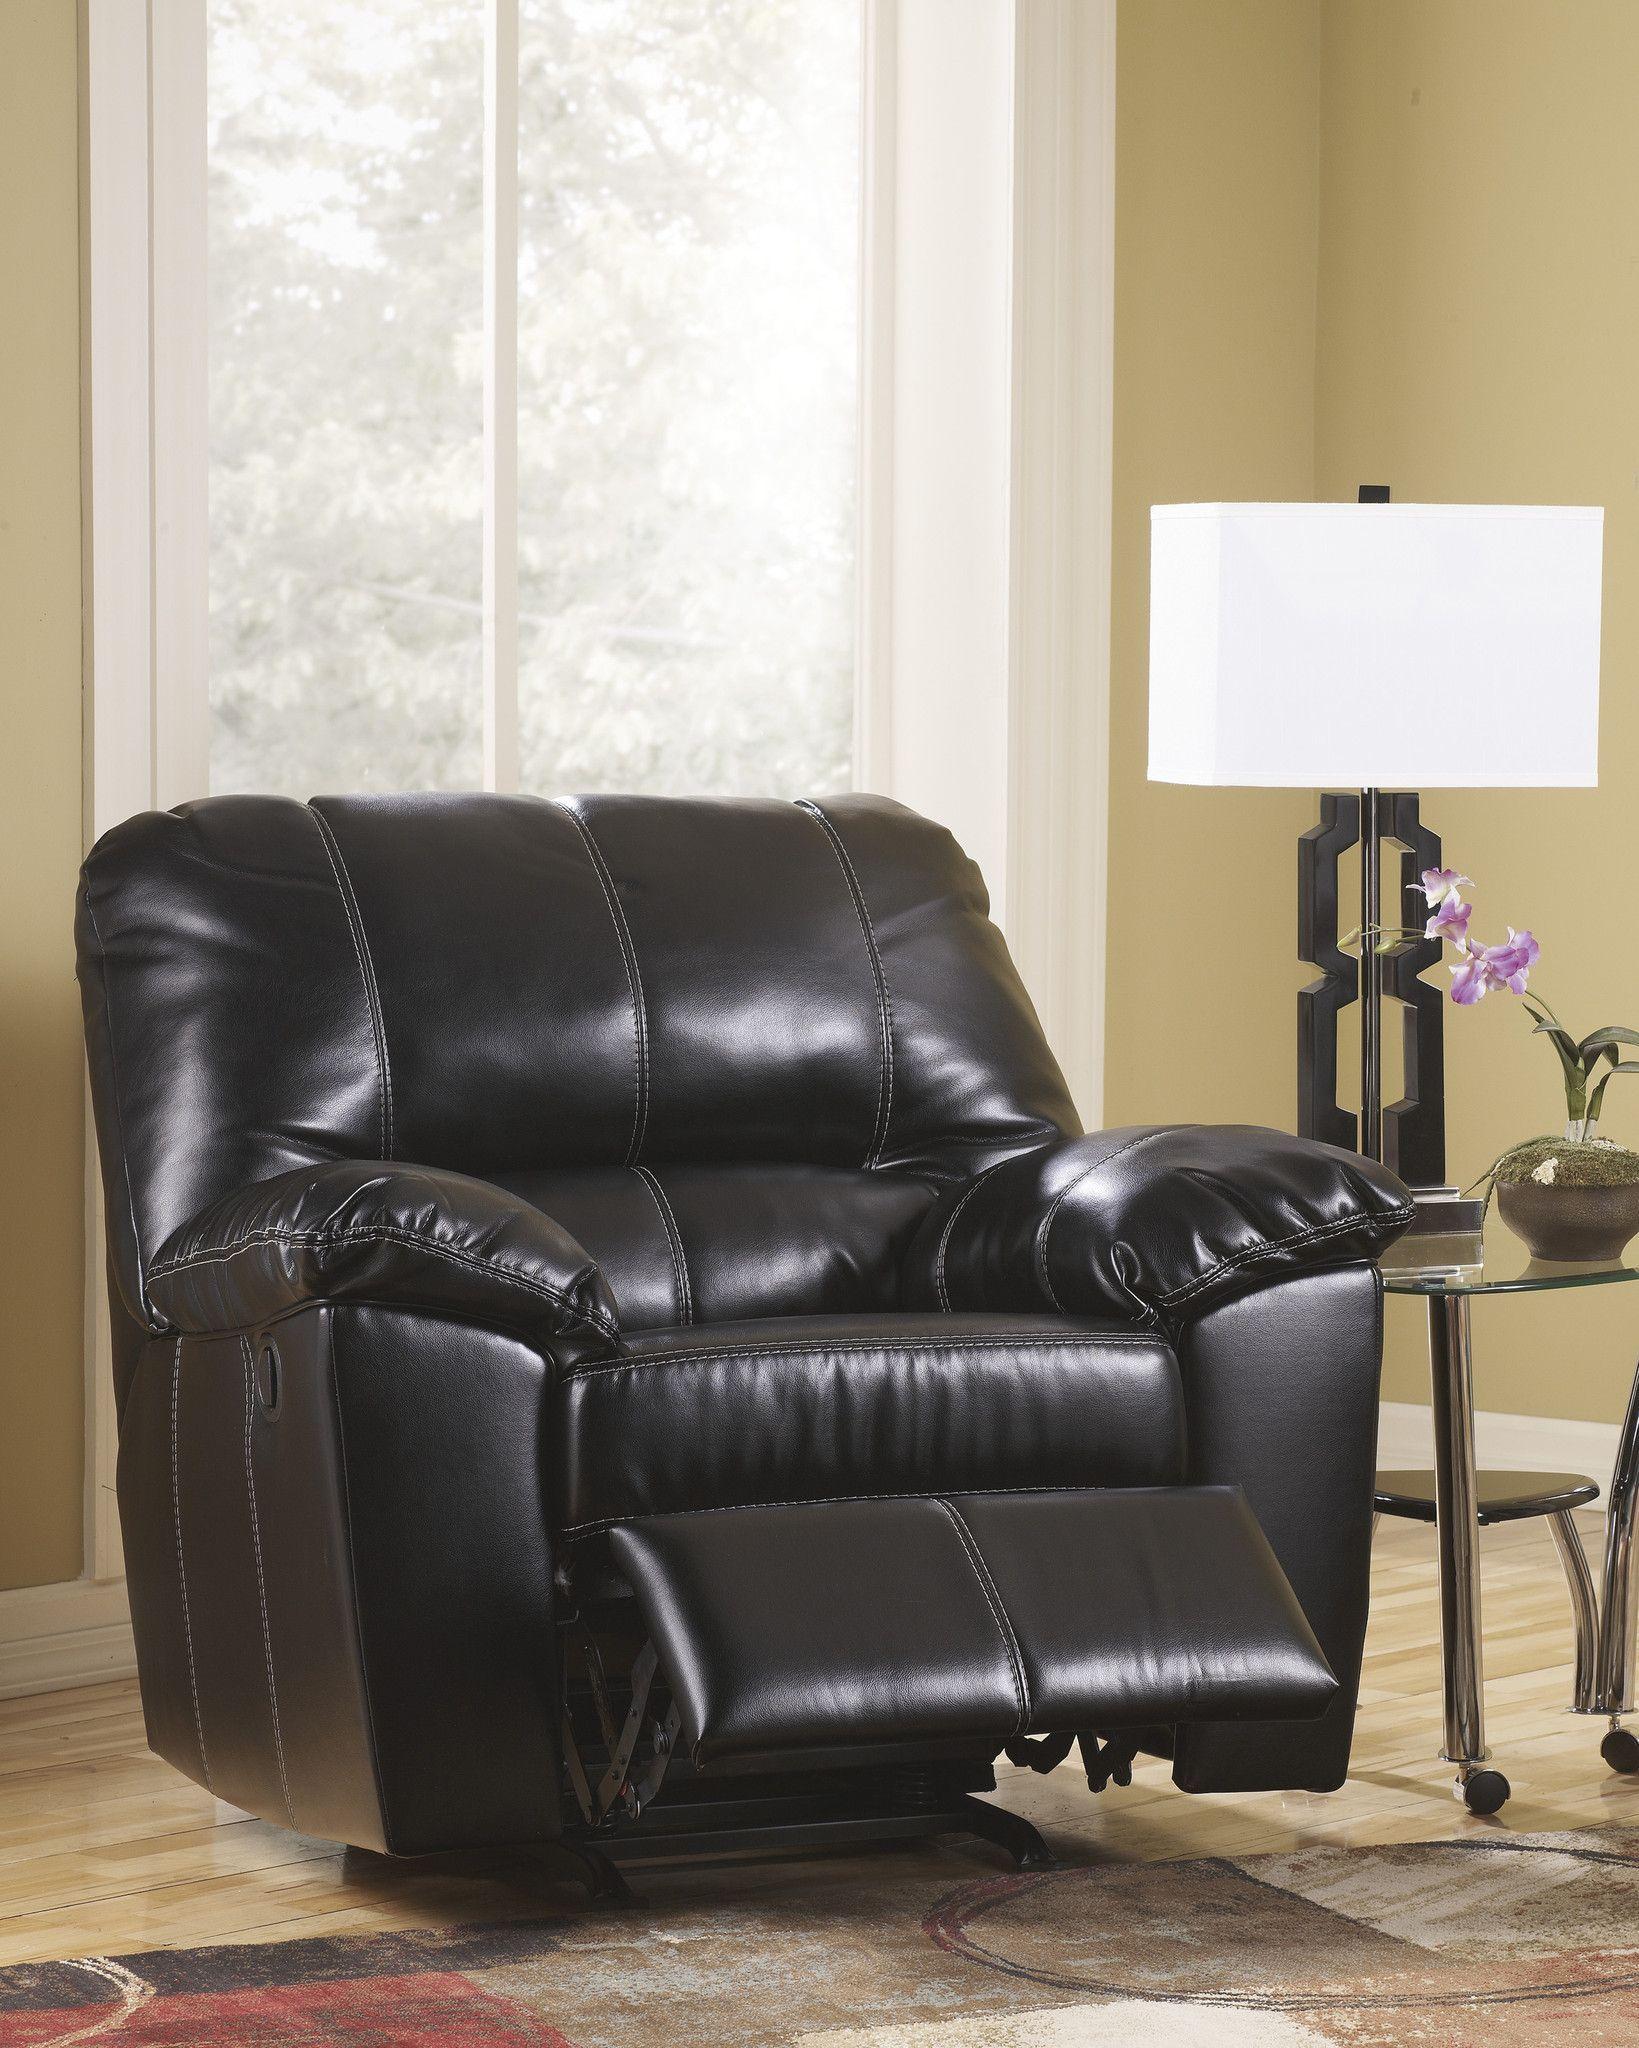 Fort logan durablend rocker recliner fort logan durablend rocker recliner signature design living room chairs